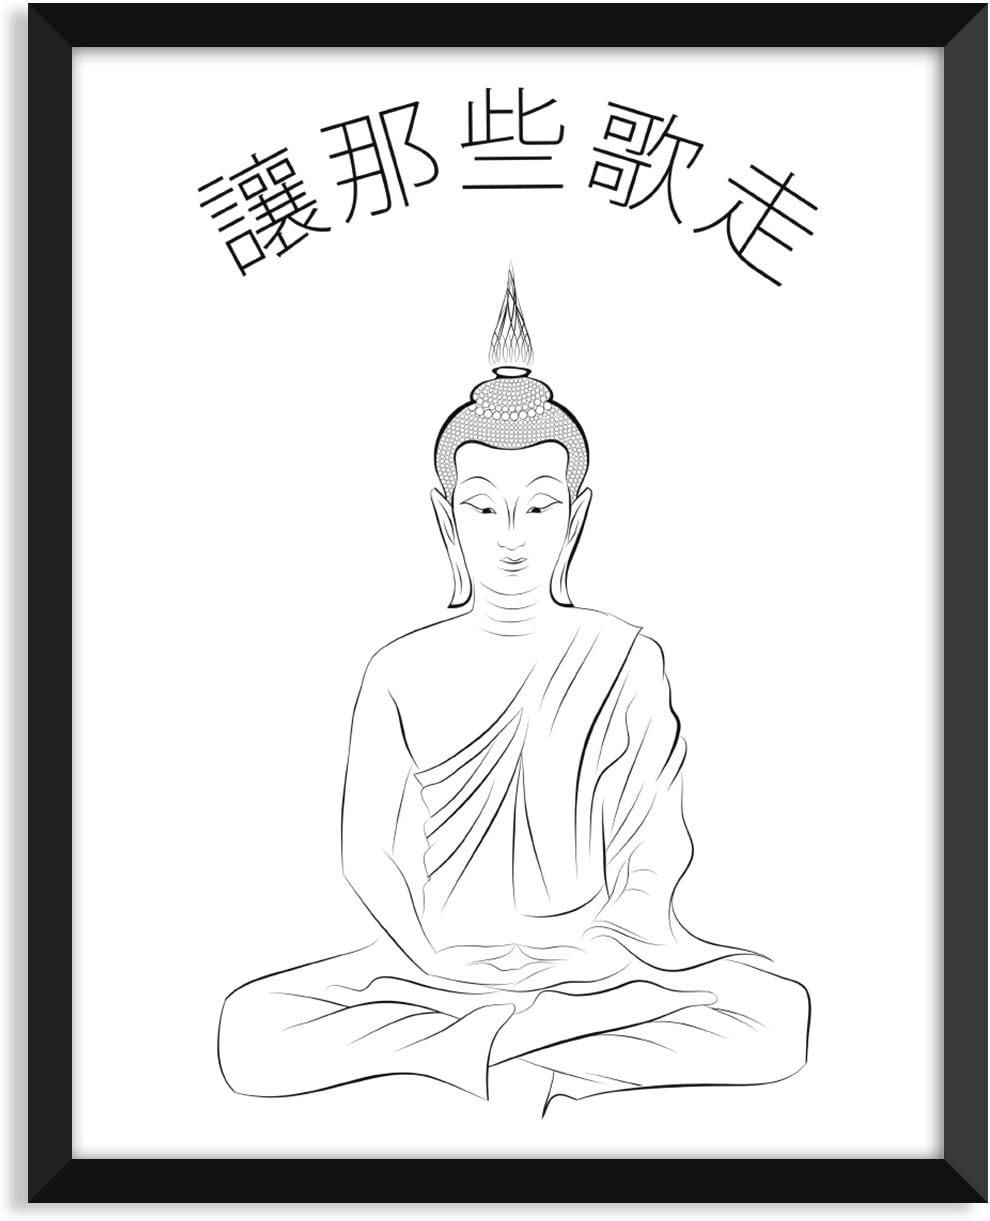 Serif Design Studios Let That Shit Go - Buddha - Chinese, Yoga Poster, Zen, Buddha, Minimalist Poster, Home Decor, College Dorm Room Decorations, Wall Art